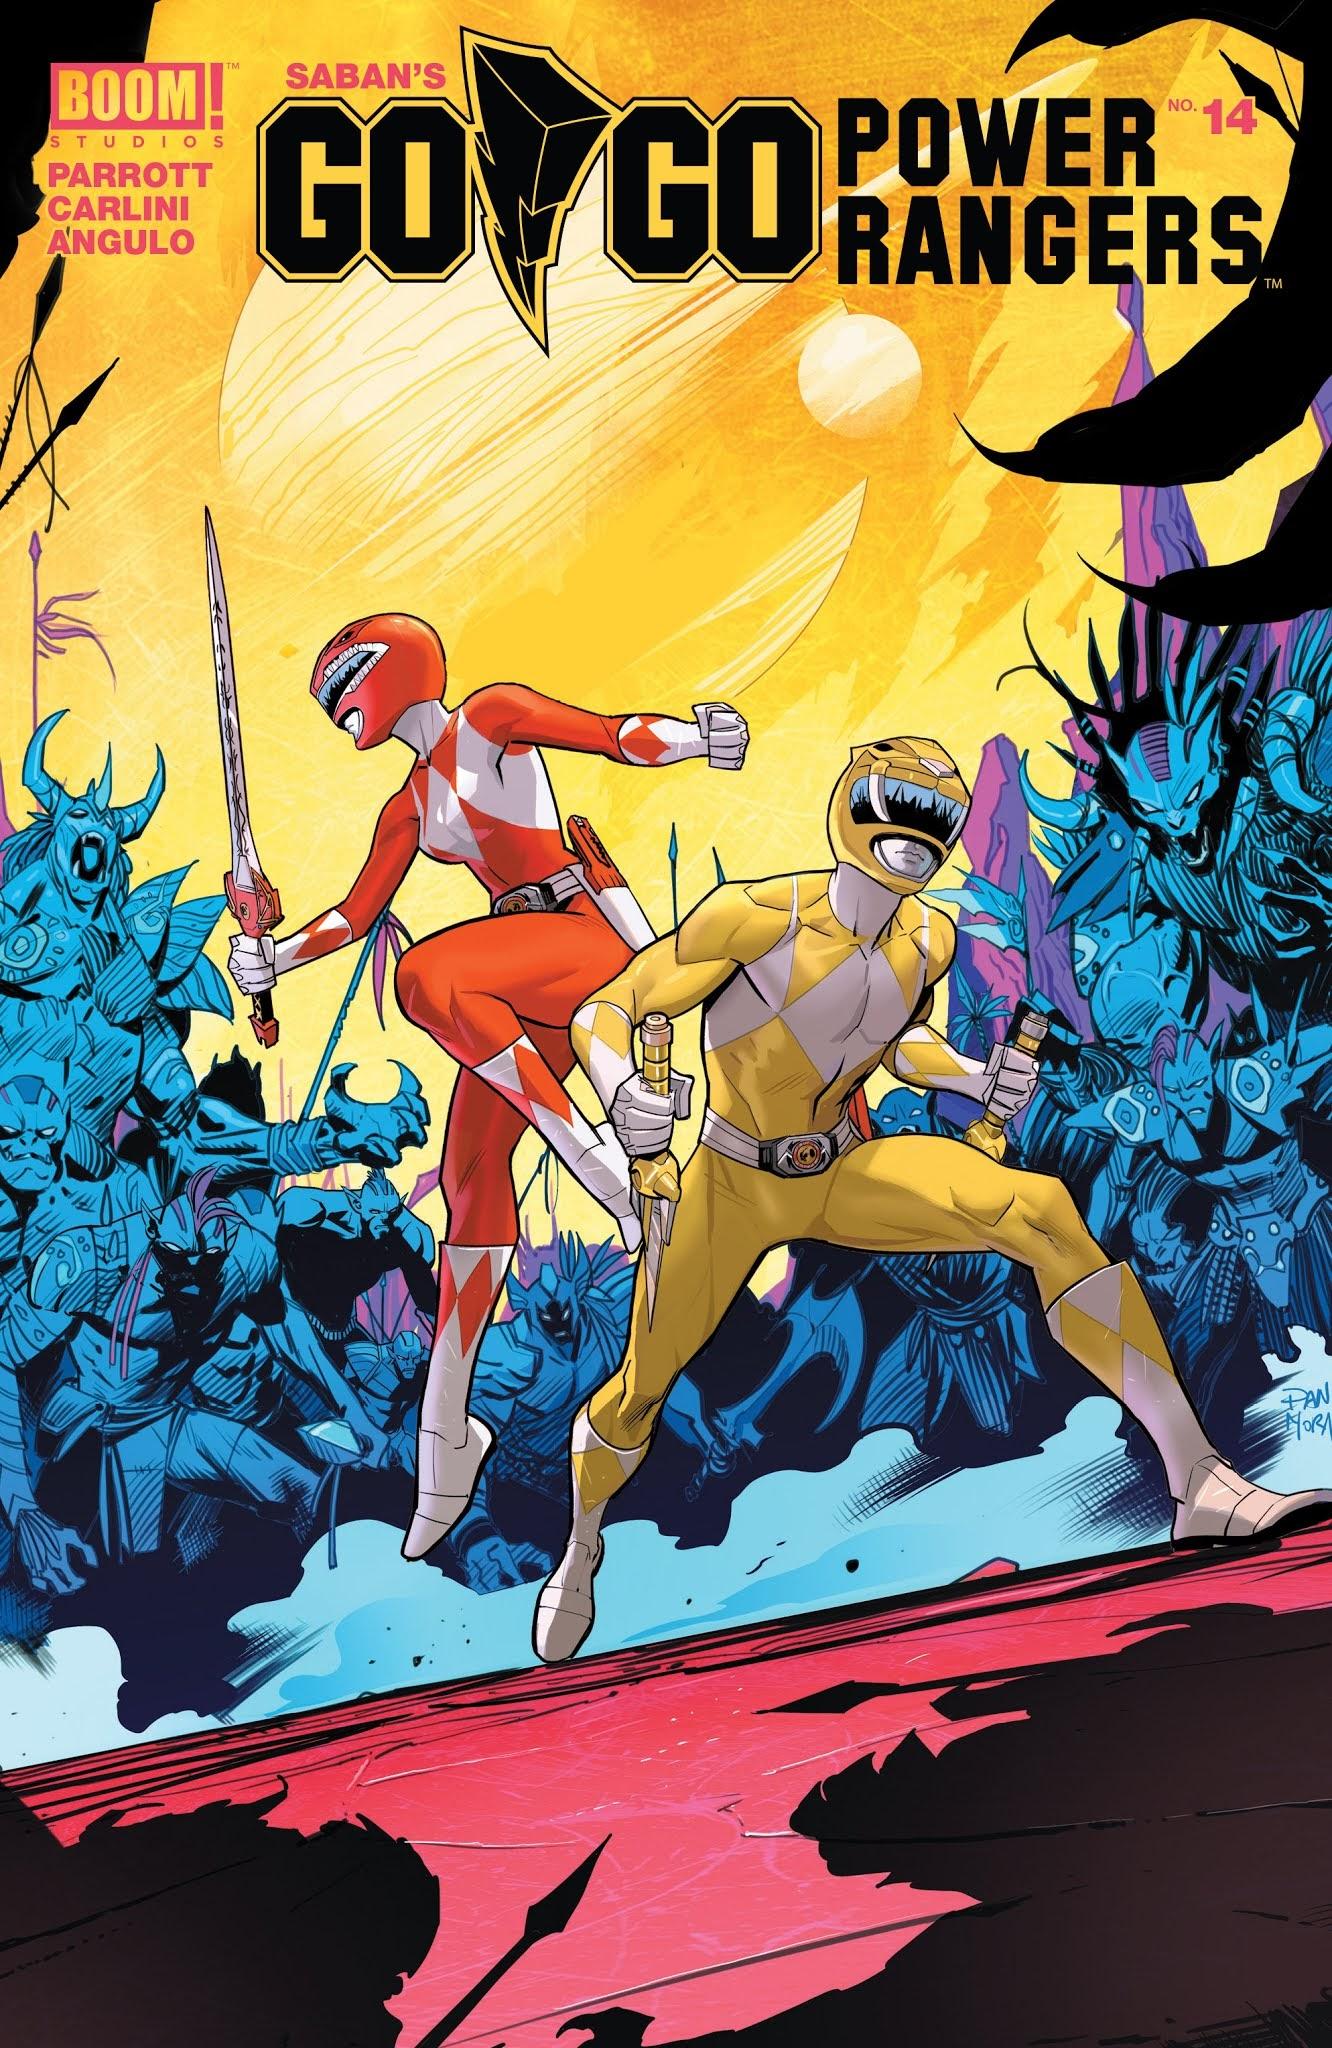 Sabans Go Go Power Rangers 14 Page 1